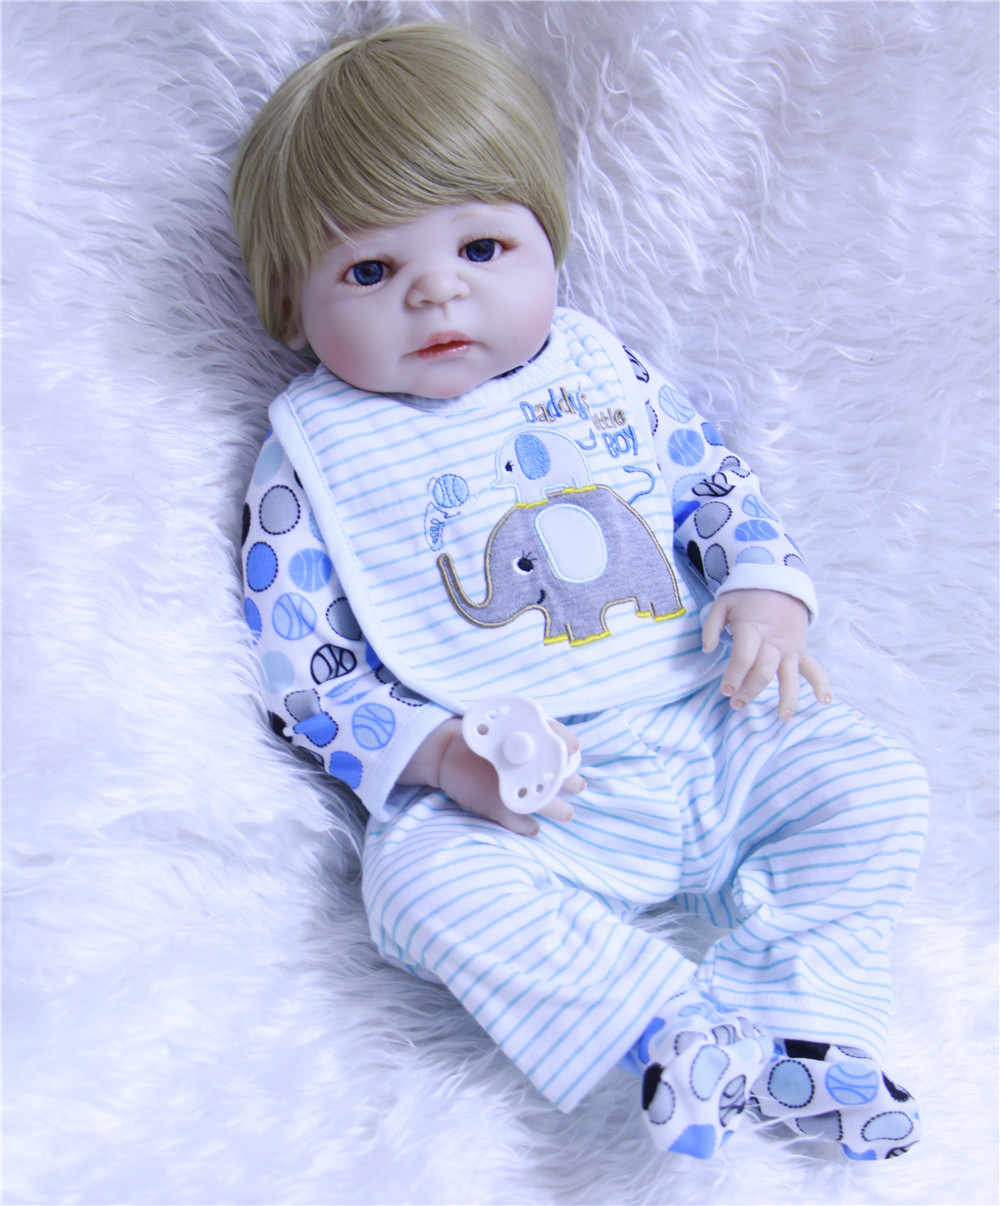 NPKCOLLECTION מזויף תינוק זכר בובות reborn מלא סיליקון reborn תינוקות ילדי מתנת חינוך צעצוע בובות bebes reborn menino